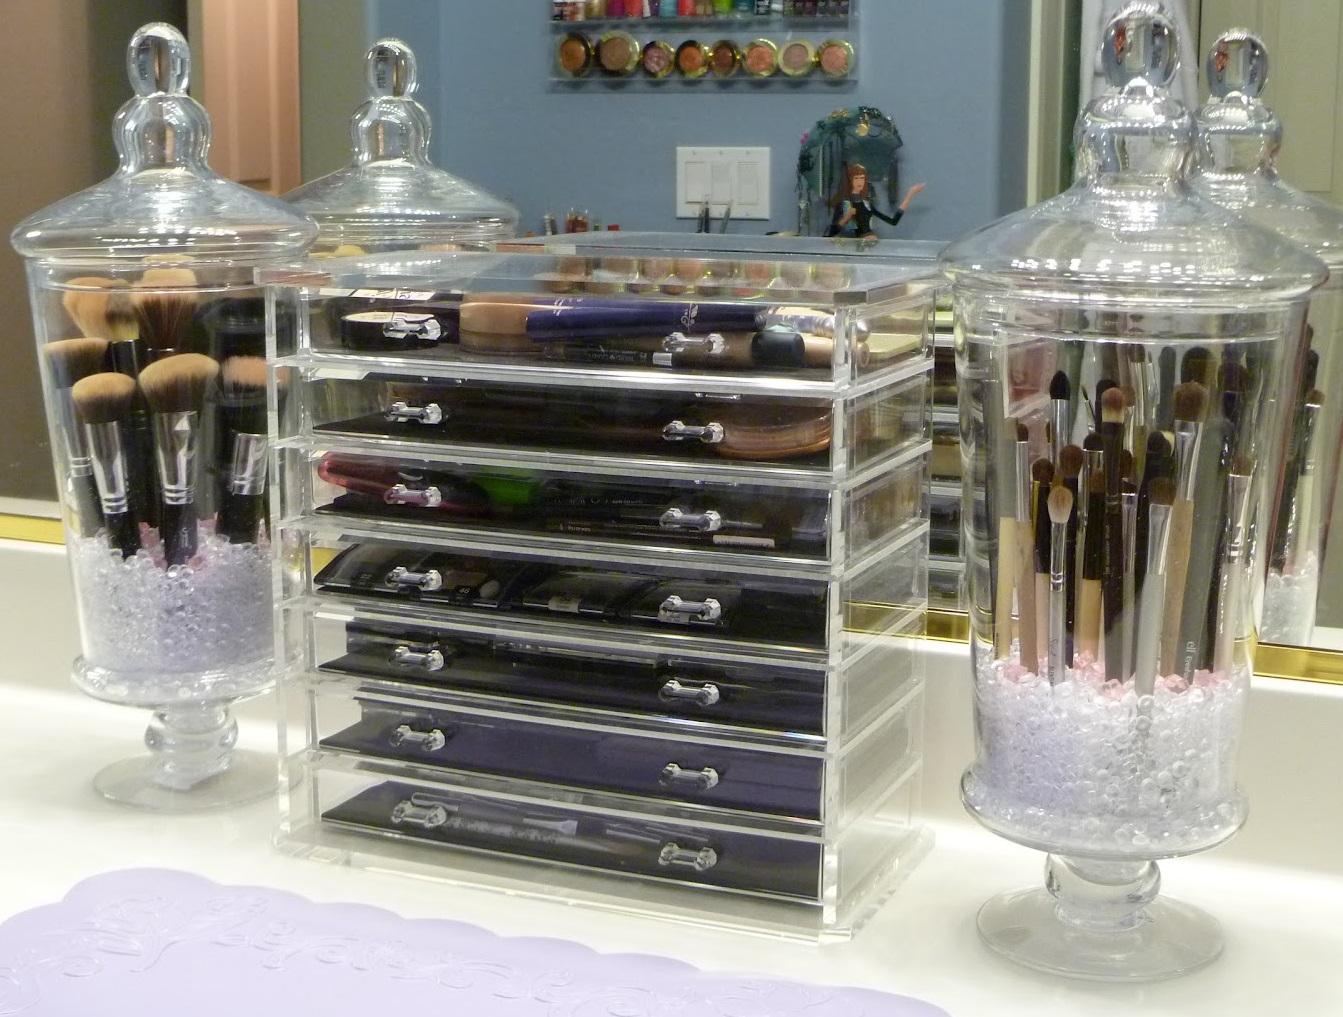 Charmant Bathroom Vanity Storage Solutions Appealing Counter regarding measurements 1343 X 1017